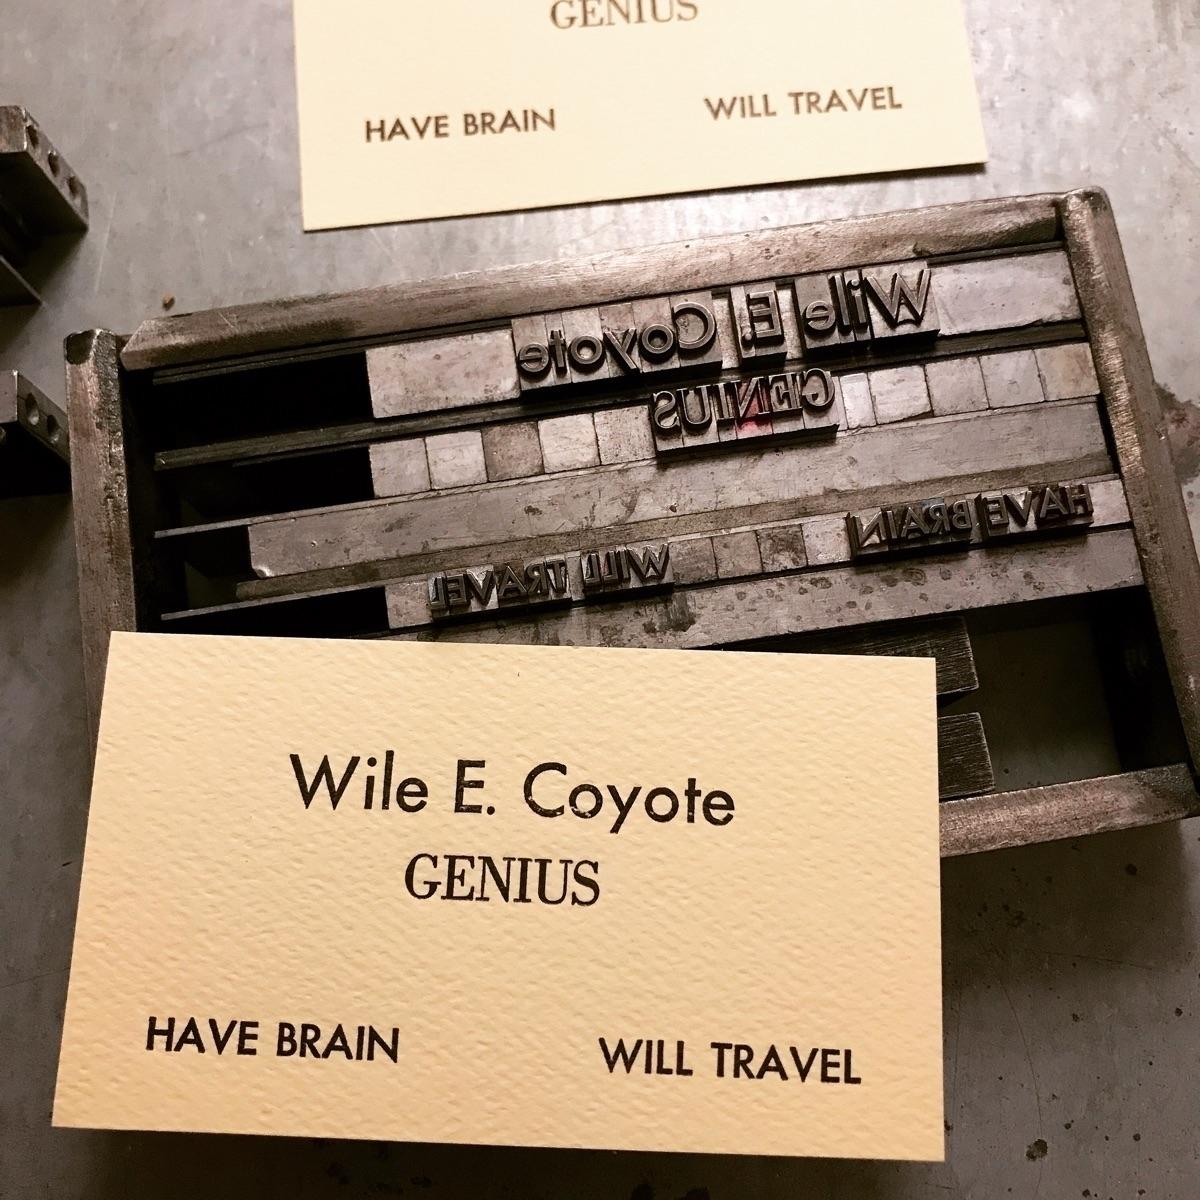 stable genius | - letterpress - sheasmith | ello